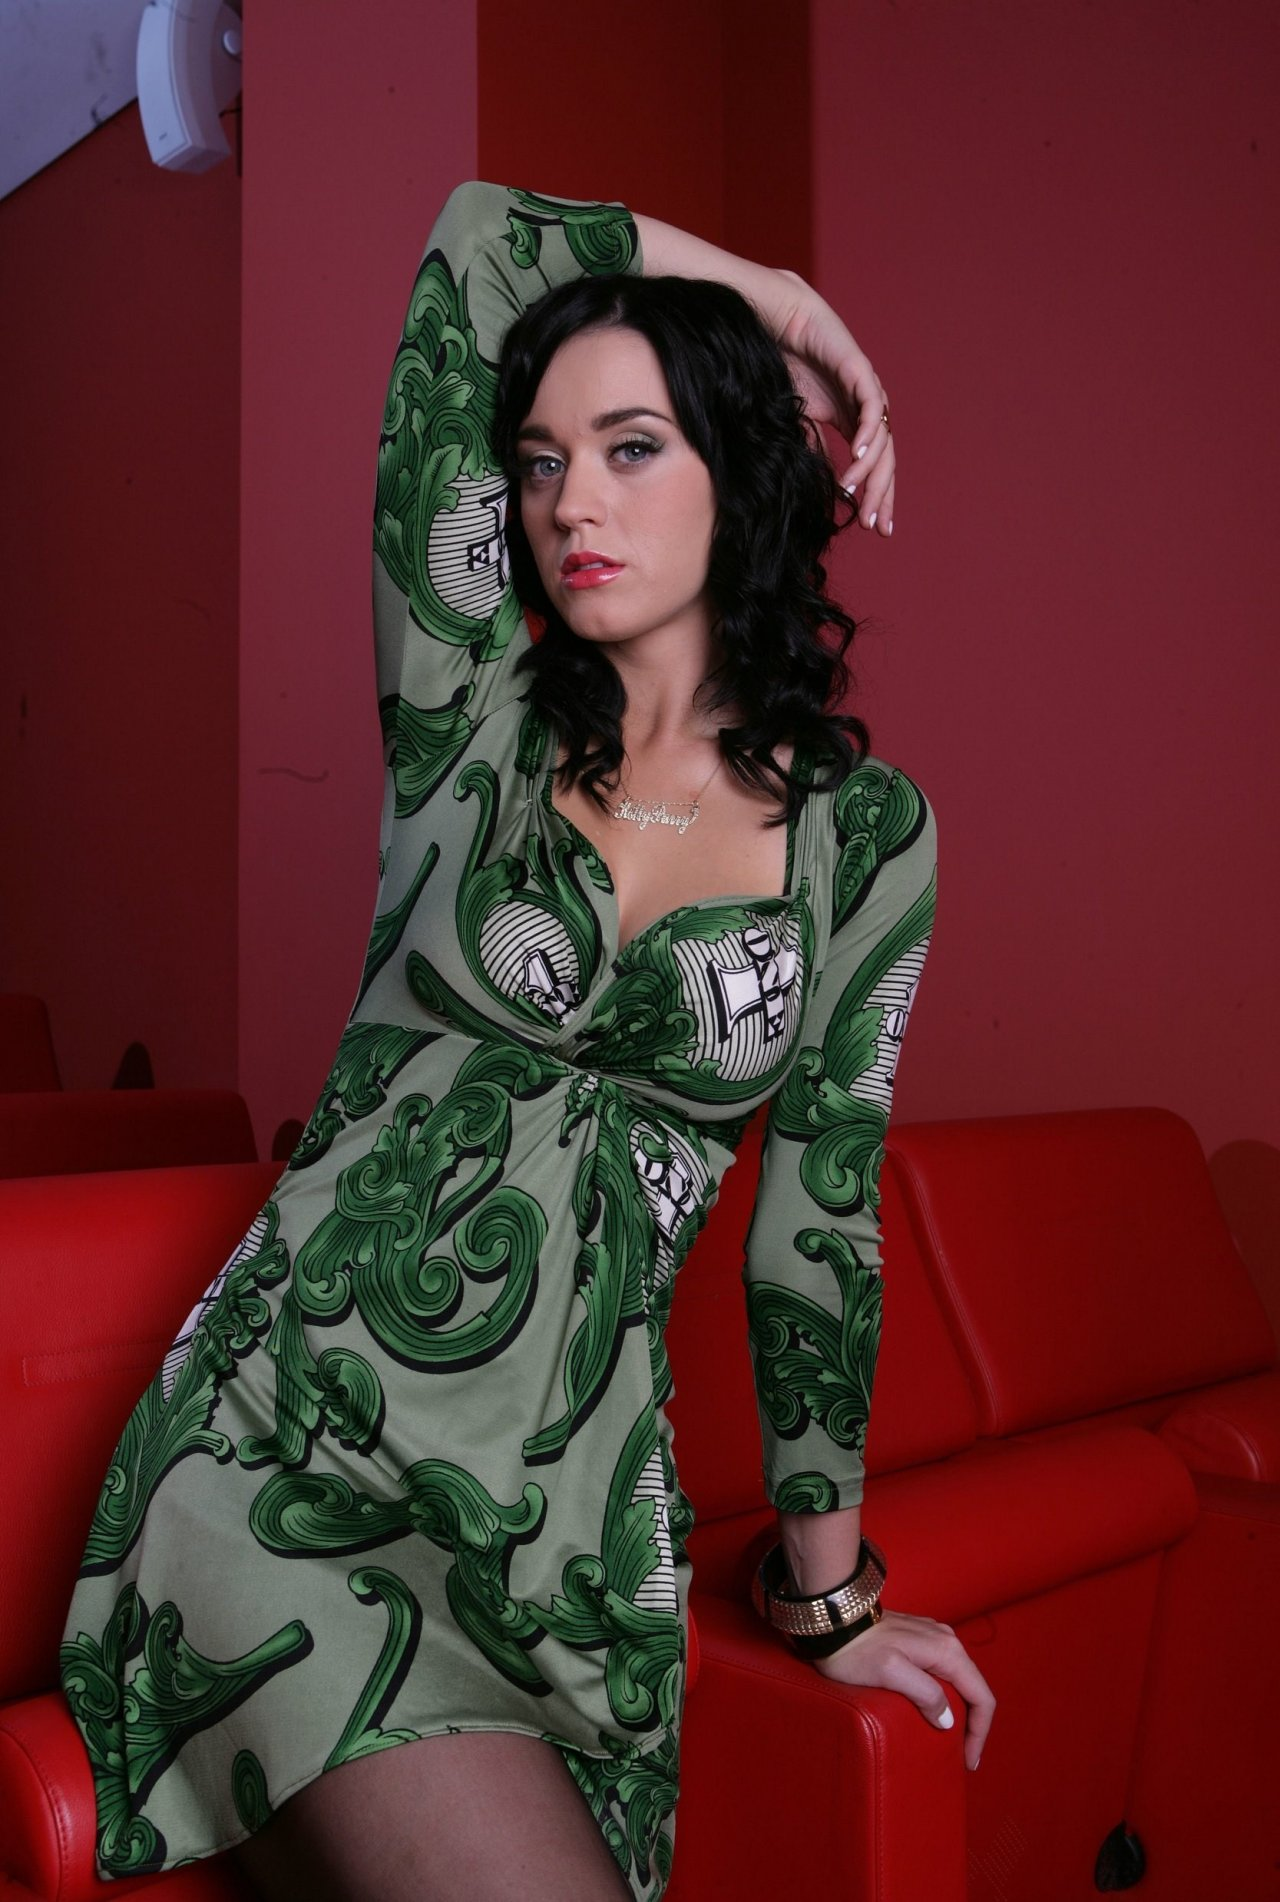 Katy Perry Leaked Photos | Cute Celeb Wallpaper